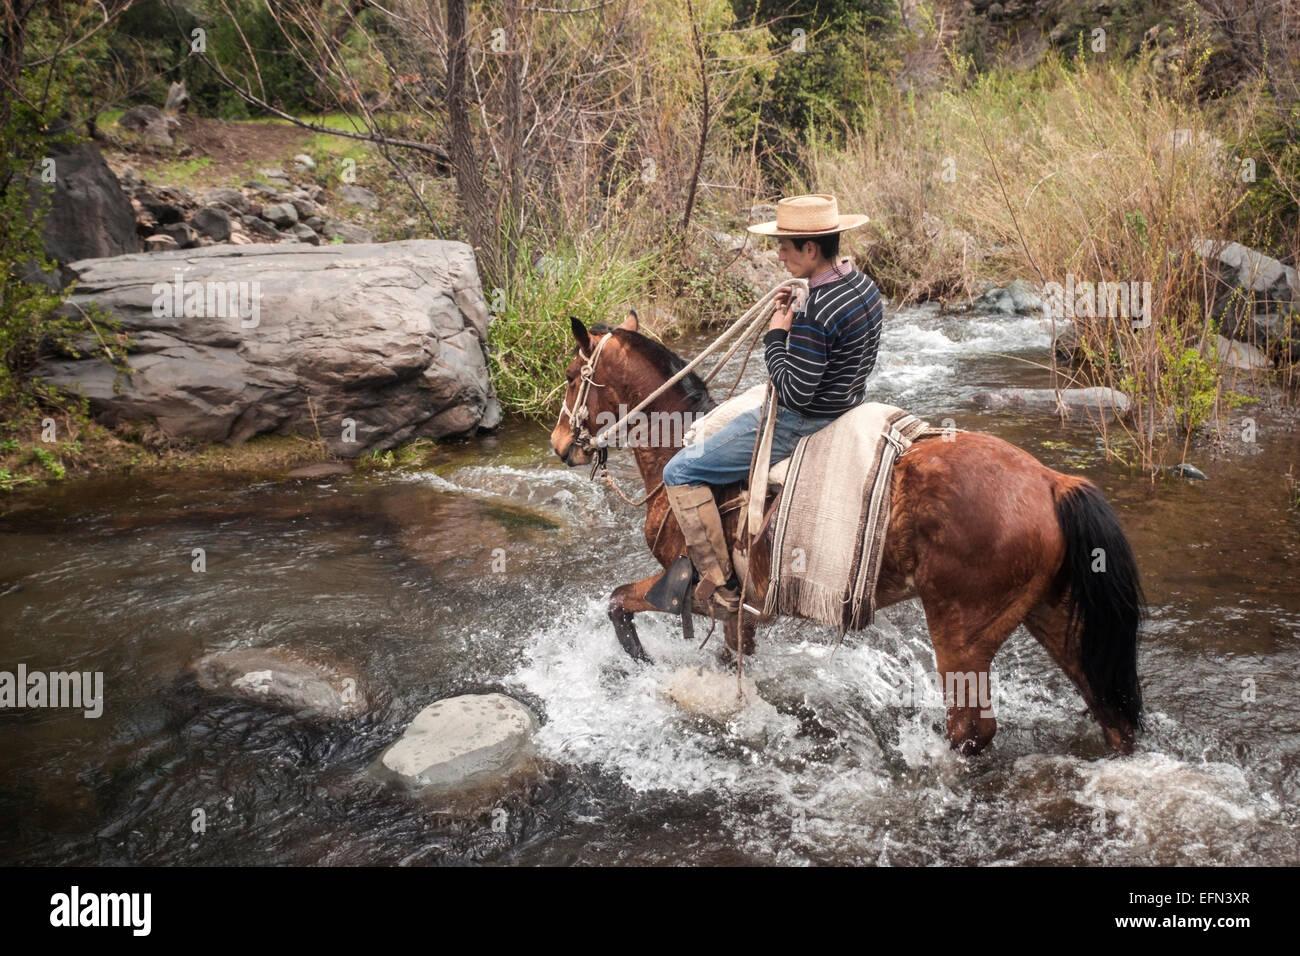 Chilean cowboy (arriero) rides his horse across a river in El Toyo region of Cajon del Maipo, Chile, South America - Stock Image